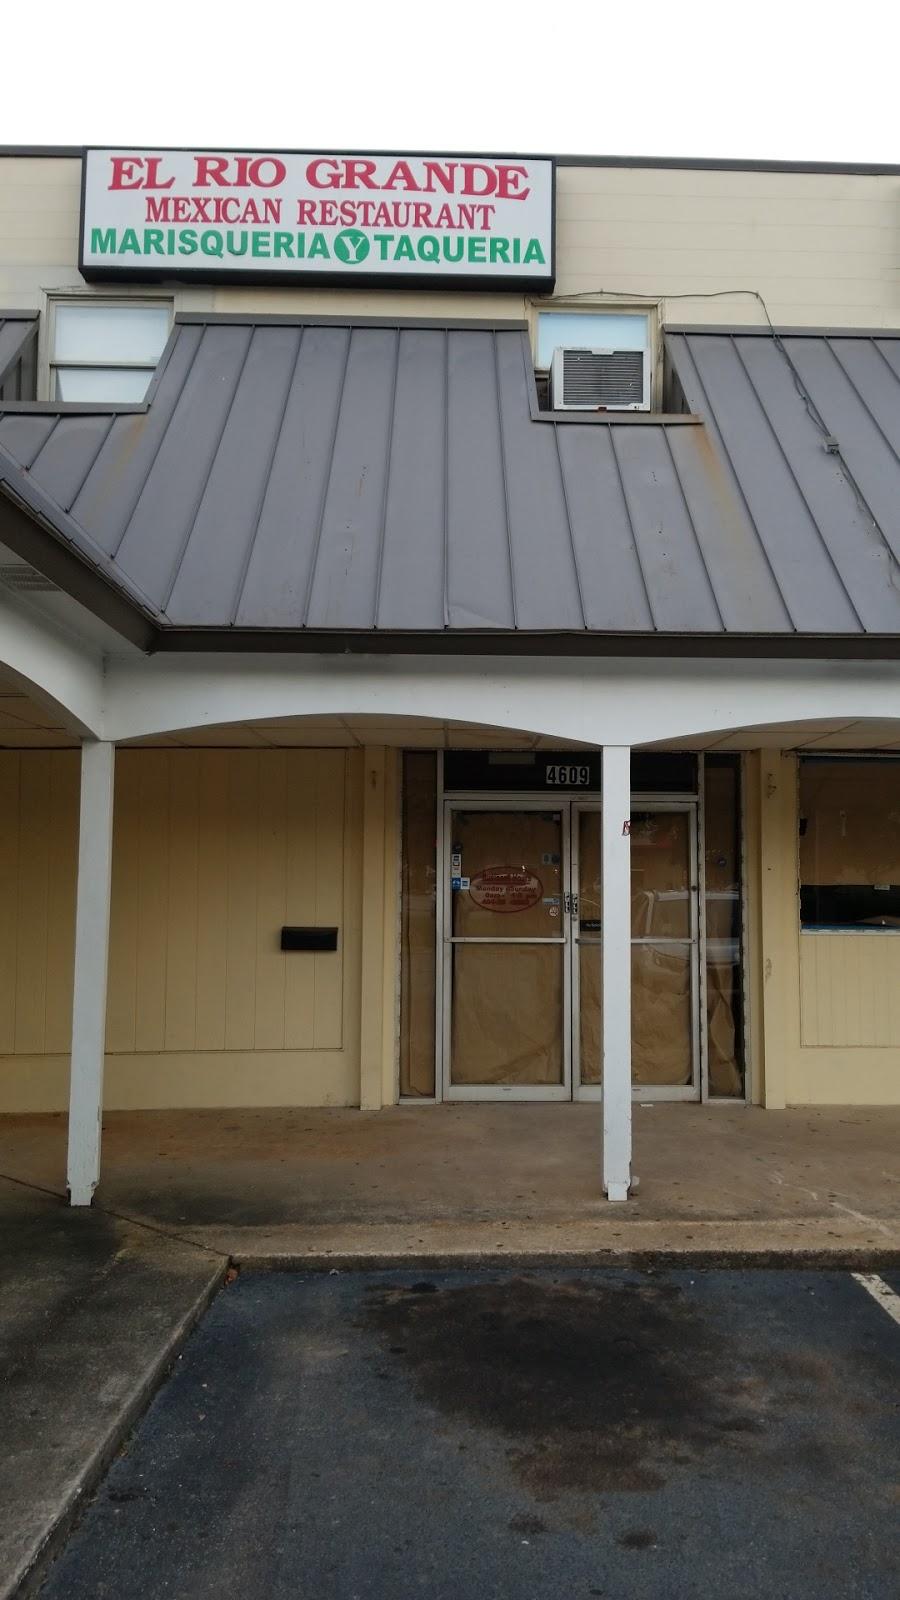 El Rio Grande Restaurant - restaurant    Photo 5 of 10   Address: 4035 Jonesboro Rd, Forest Park, GA 30297, USA   Phone: (404) 361-3543